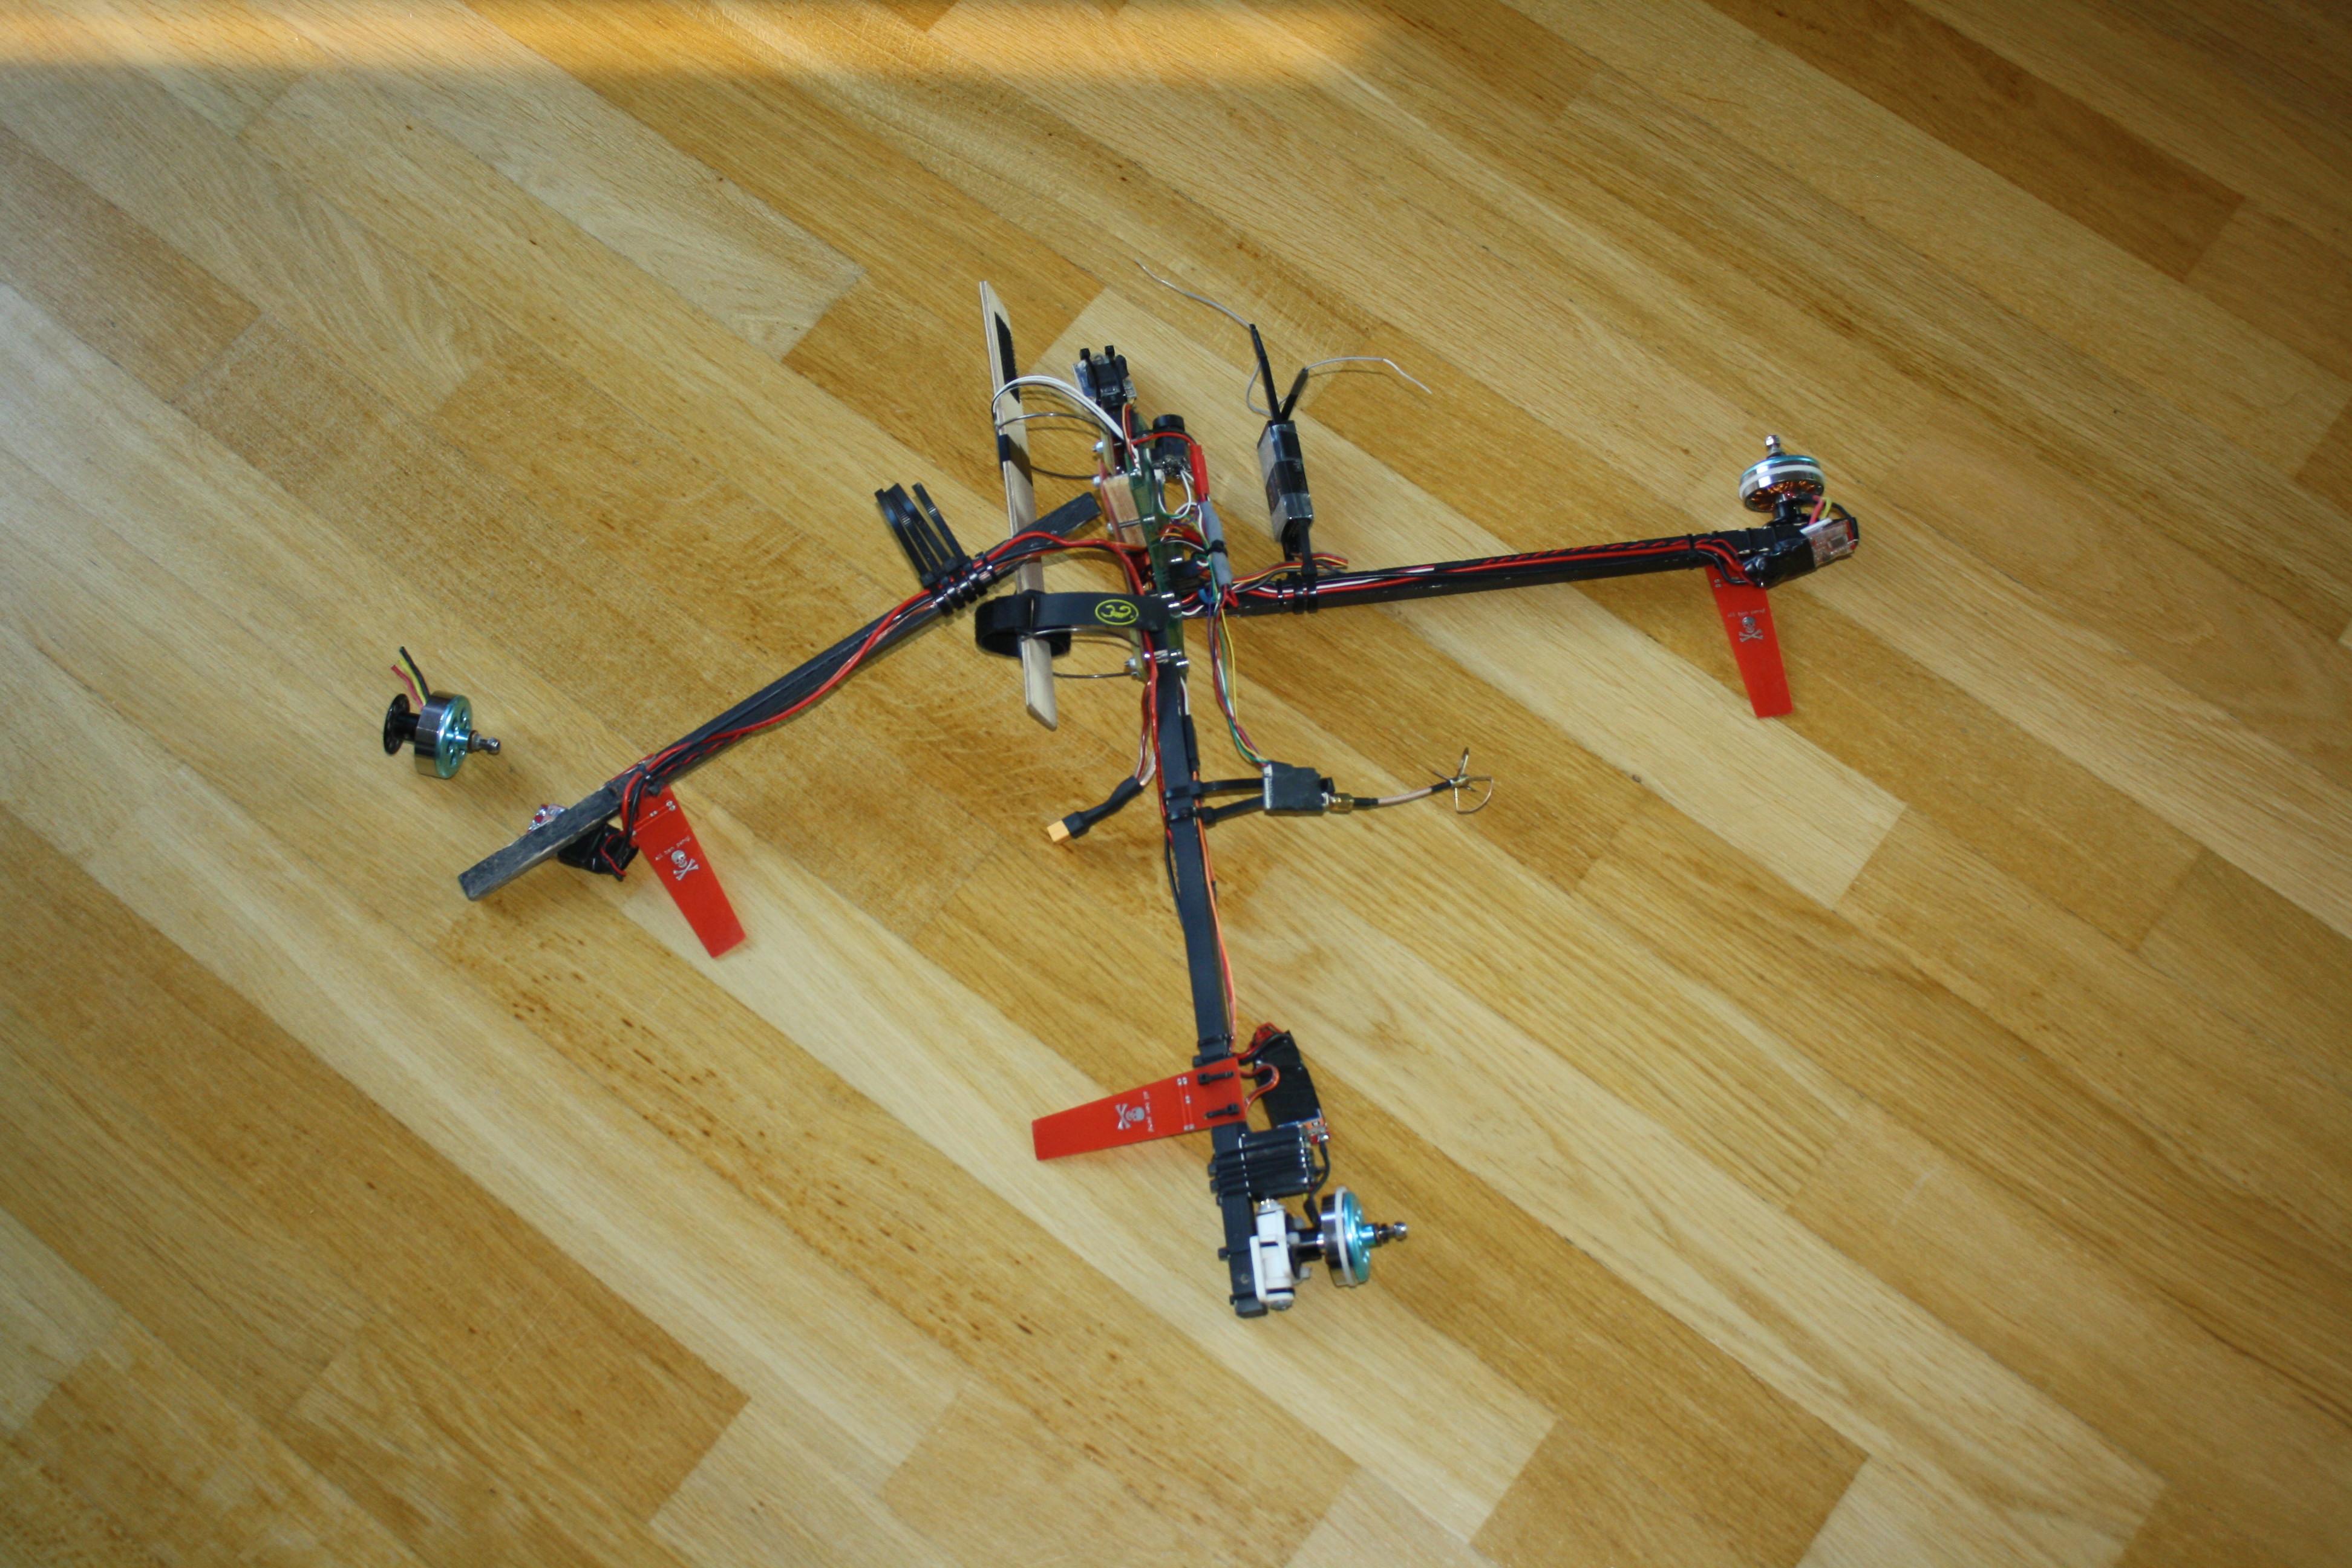 Alexander Tuxen I Make Therefore Break Diy Printed Circuit Boards Rcexplorer The Monkeybrain Went Micro